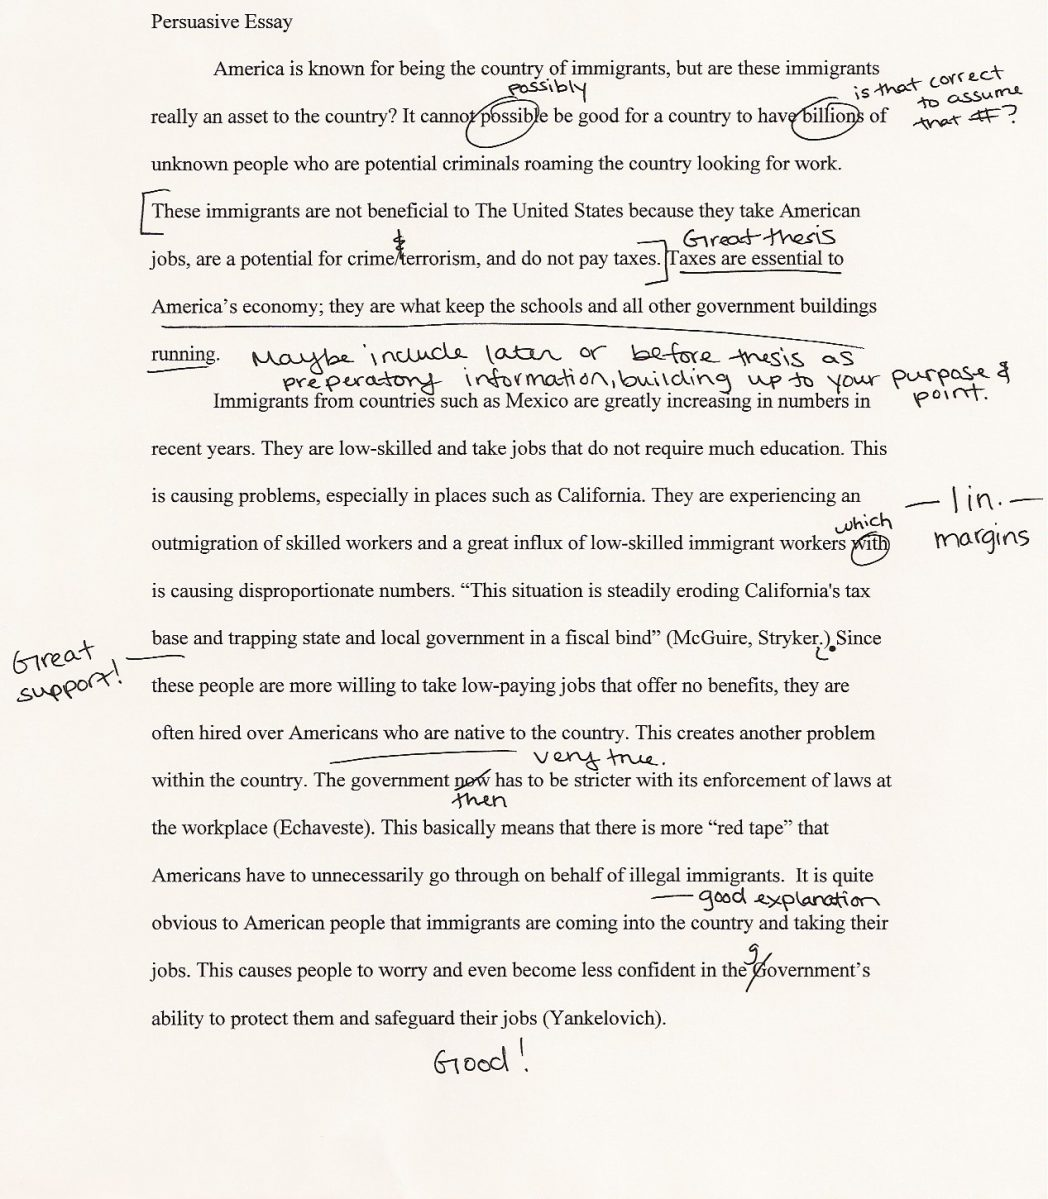 002 Essay Example Hook Examples Essays Good Hooks For College Persu Best Excellent Persuasive Narrative Full